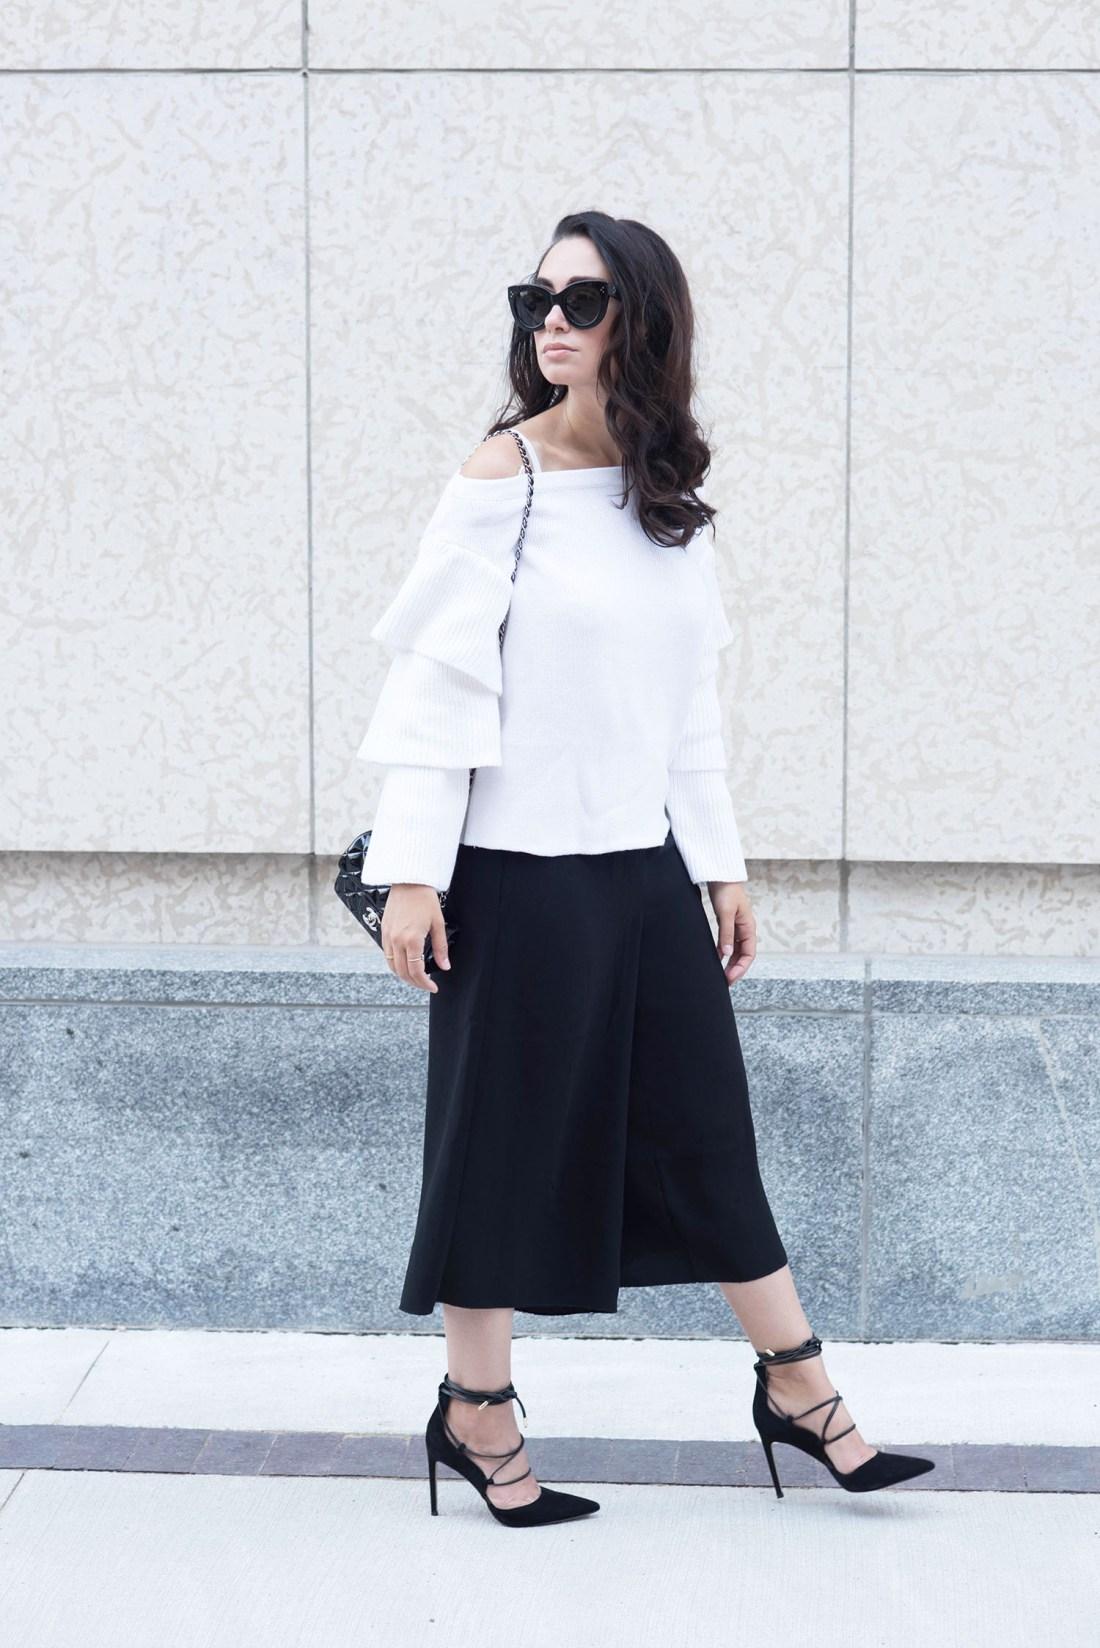 Winnipeg fashion blogger Cee Fardoe of Coco & Vera wears a white off-shoulder sweater, Aritzia black culottes and Sam Edelman lace-up heels